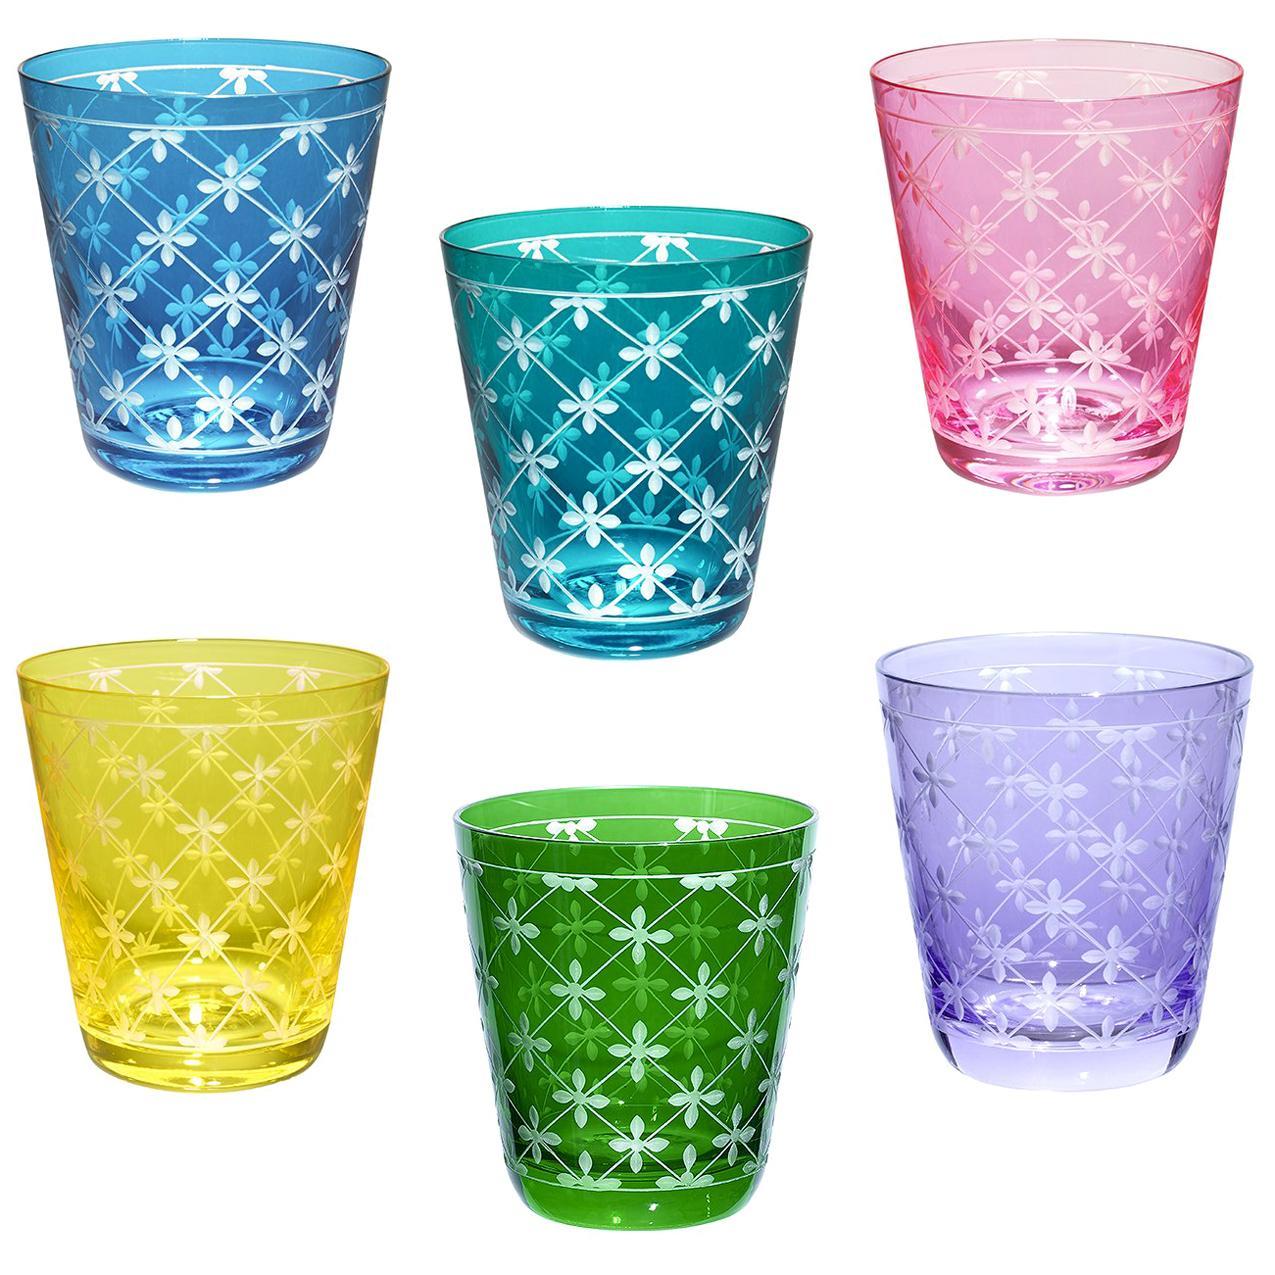 Modern Set of Six Glass Tumbler Handblown Sofina Boutique Kitzbuehel